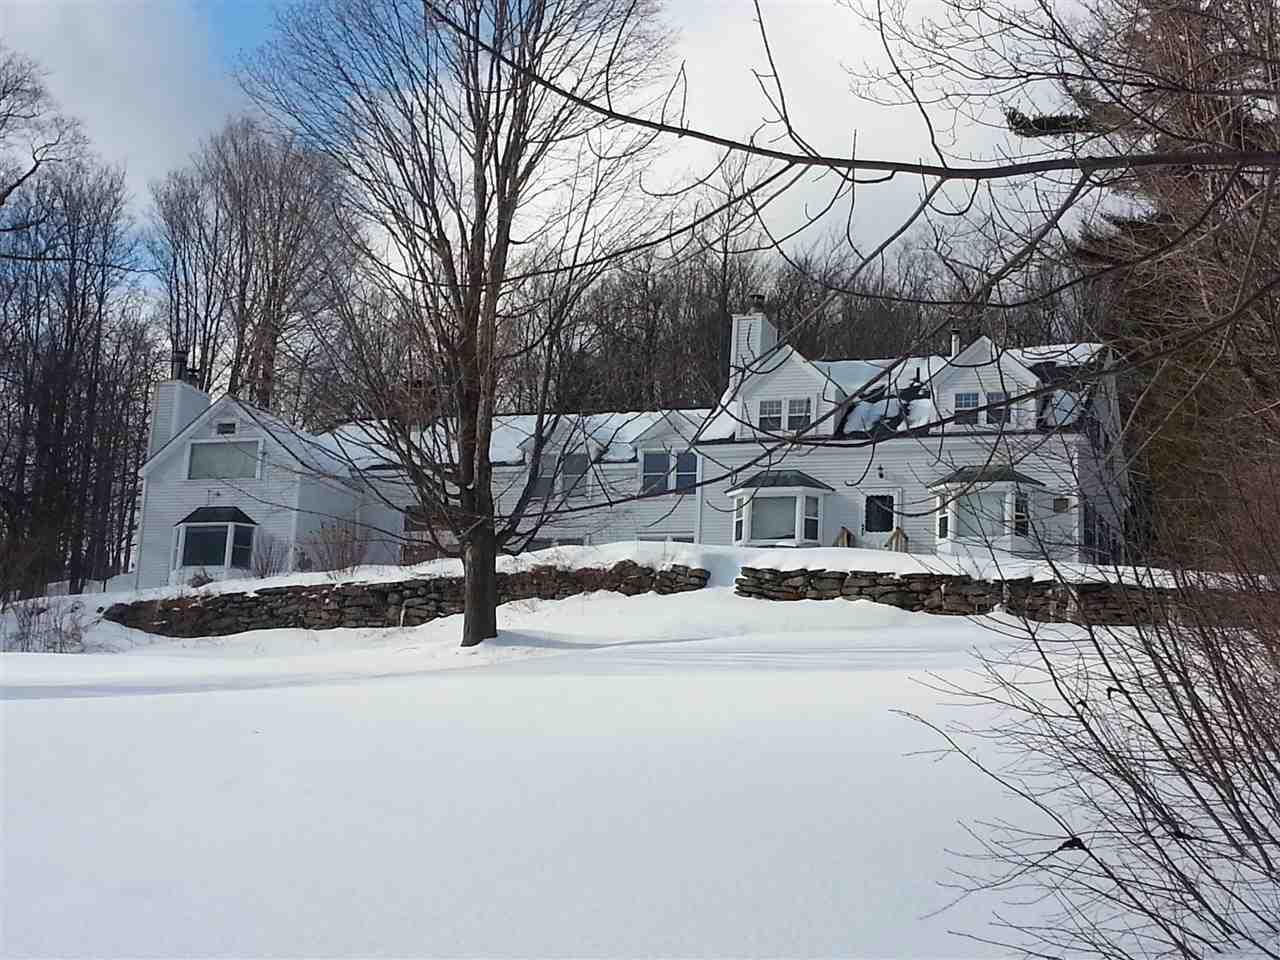 Mount-Snow-Real-Estate-4624824-23